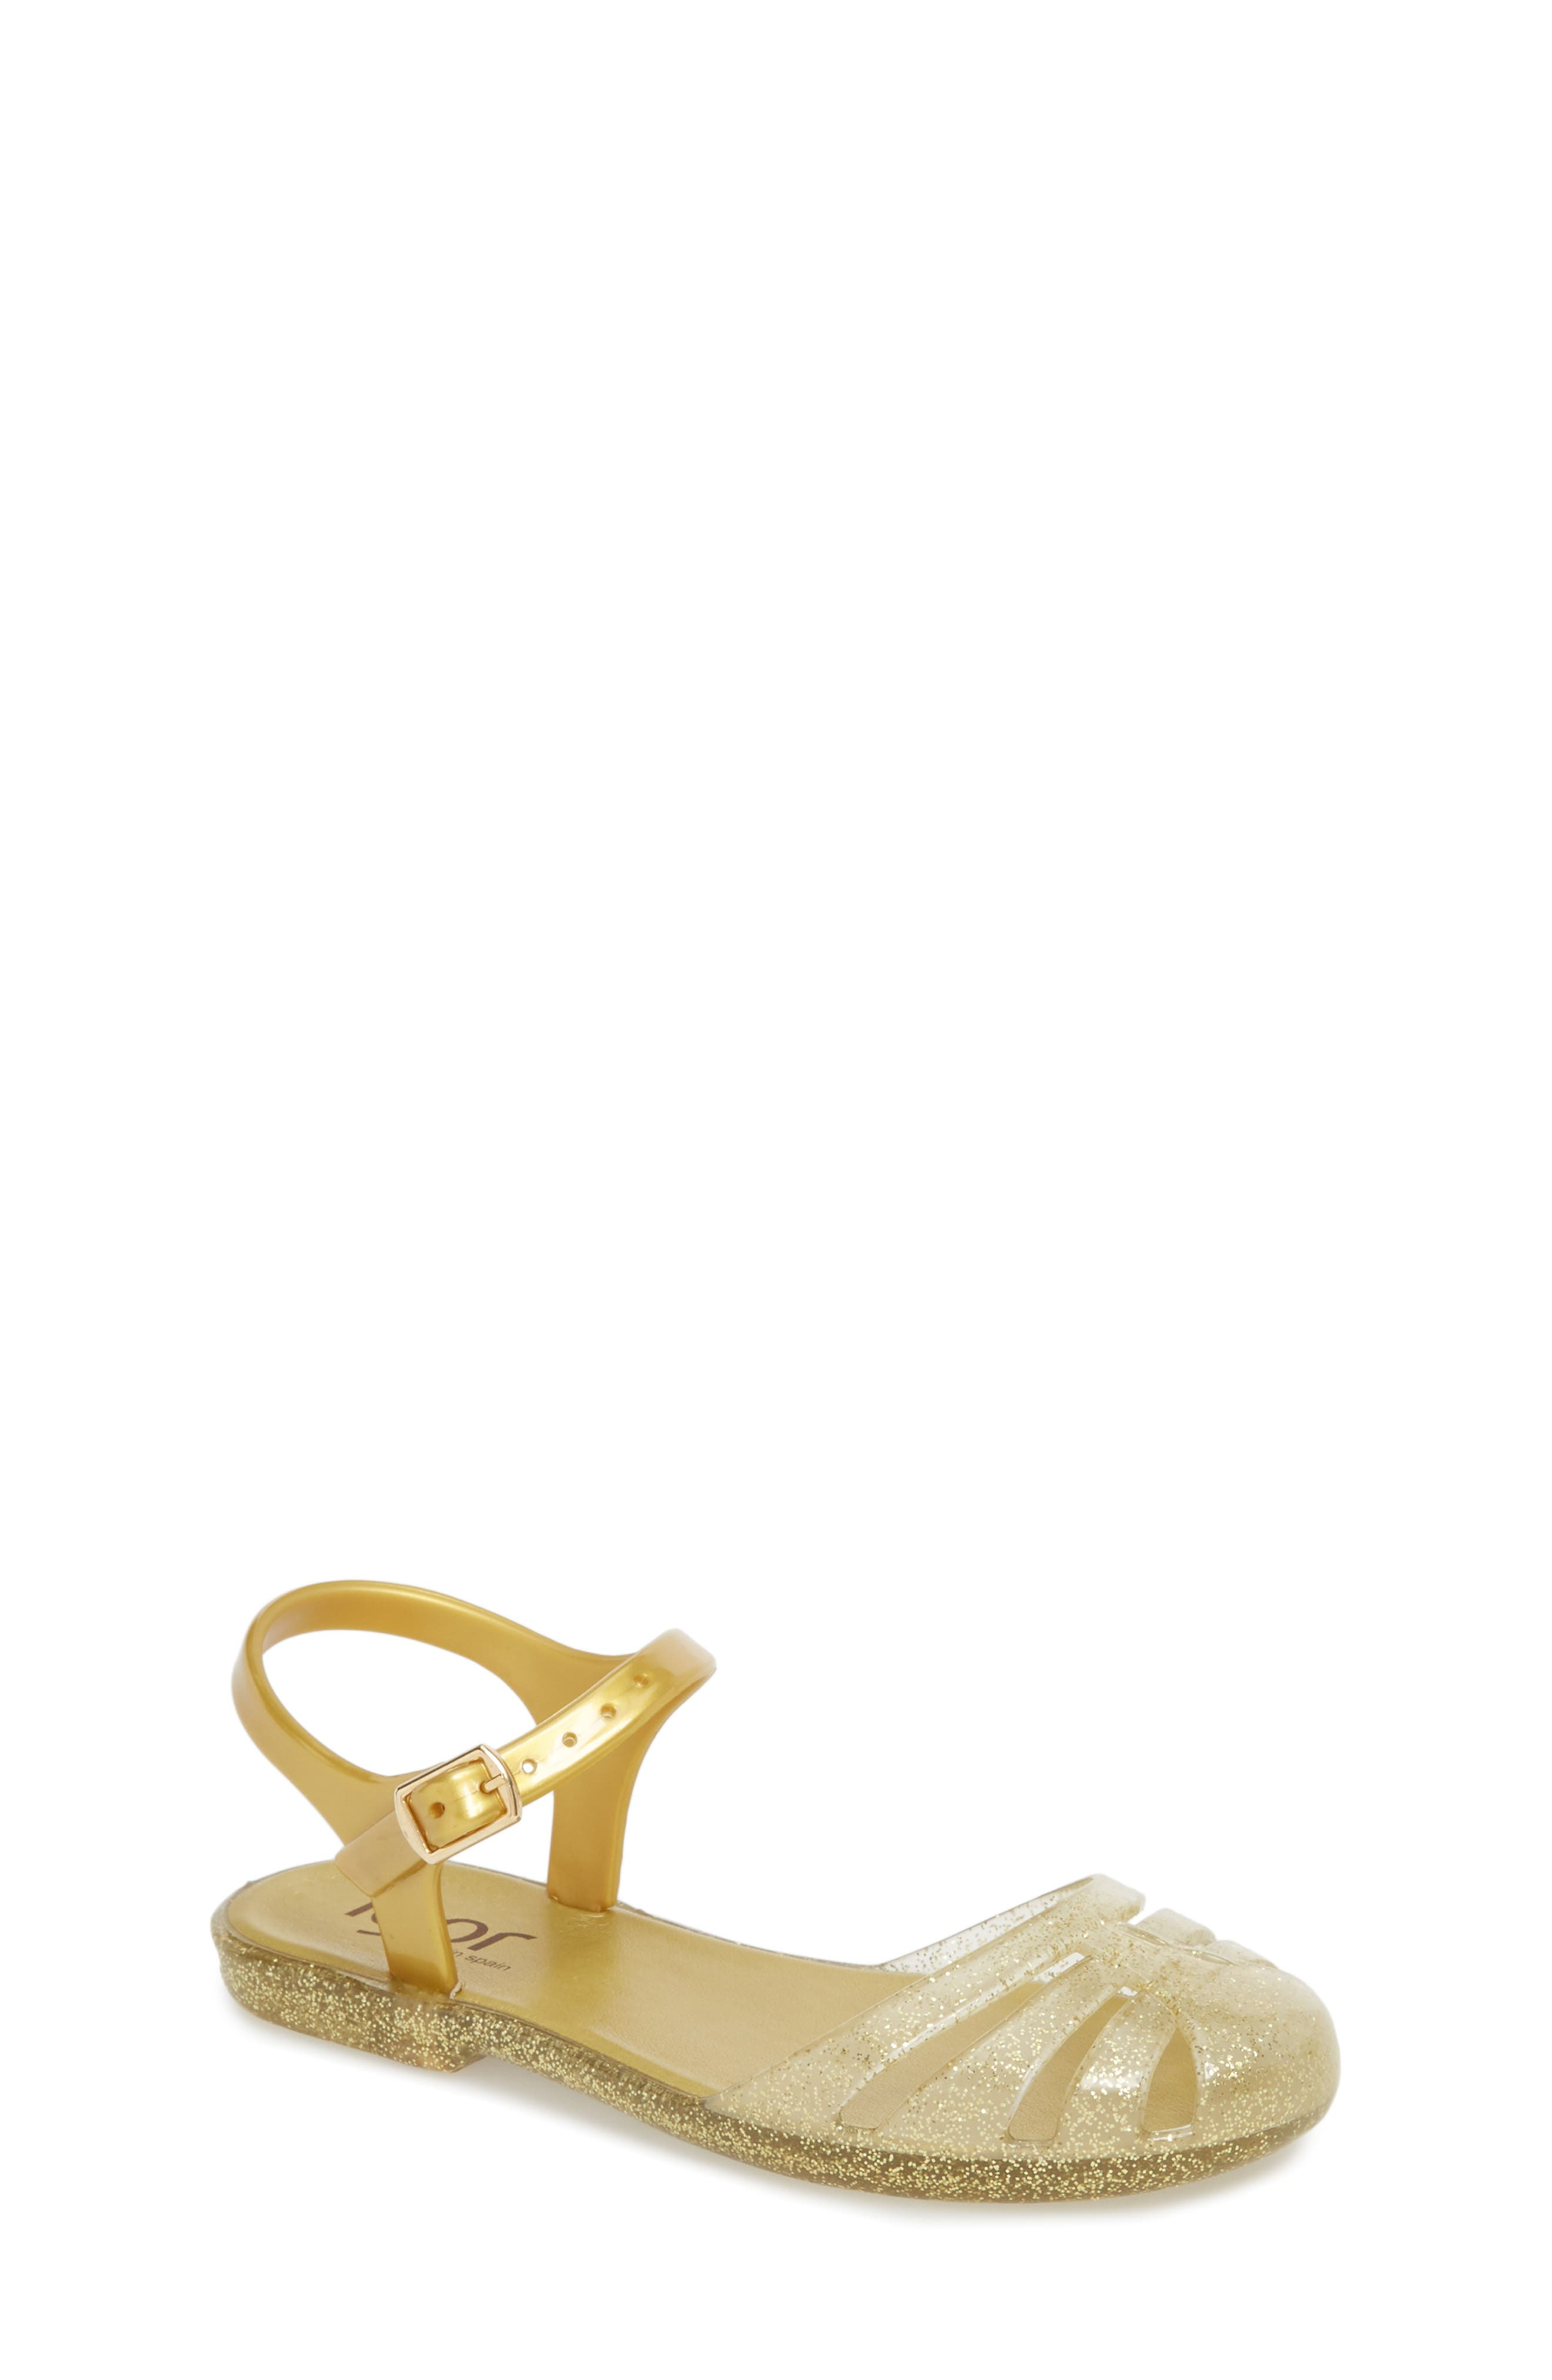 'Mara Mini' Glitter Jelly Sandal,                         Main,                         color, Gold Glitter